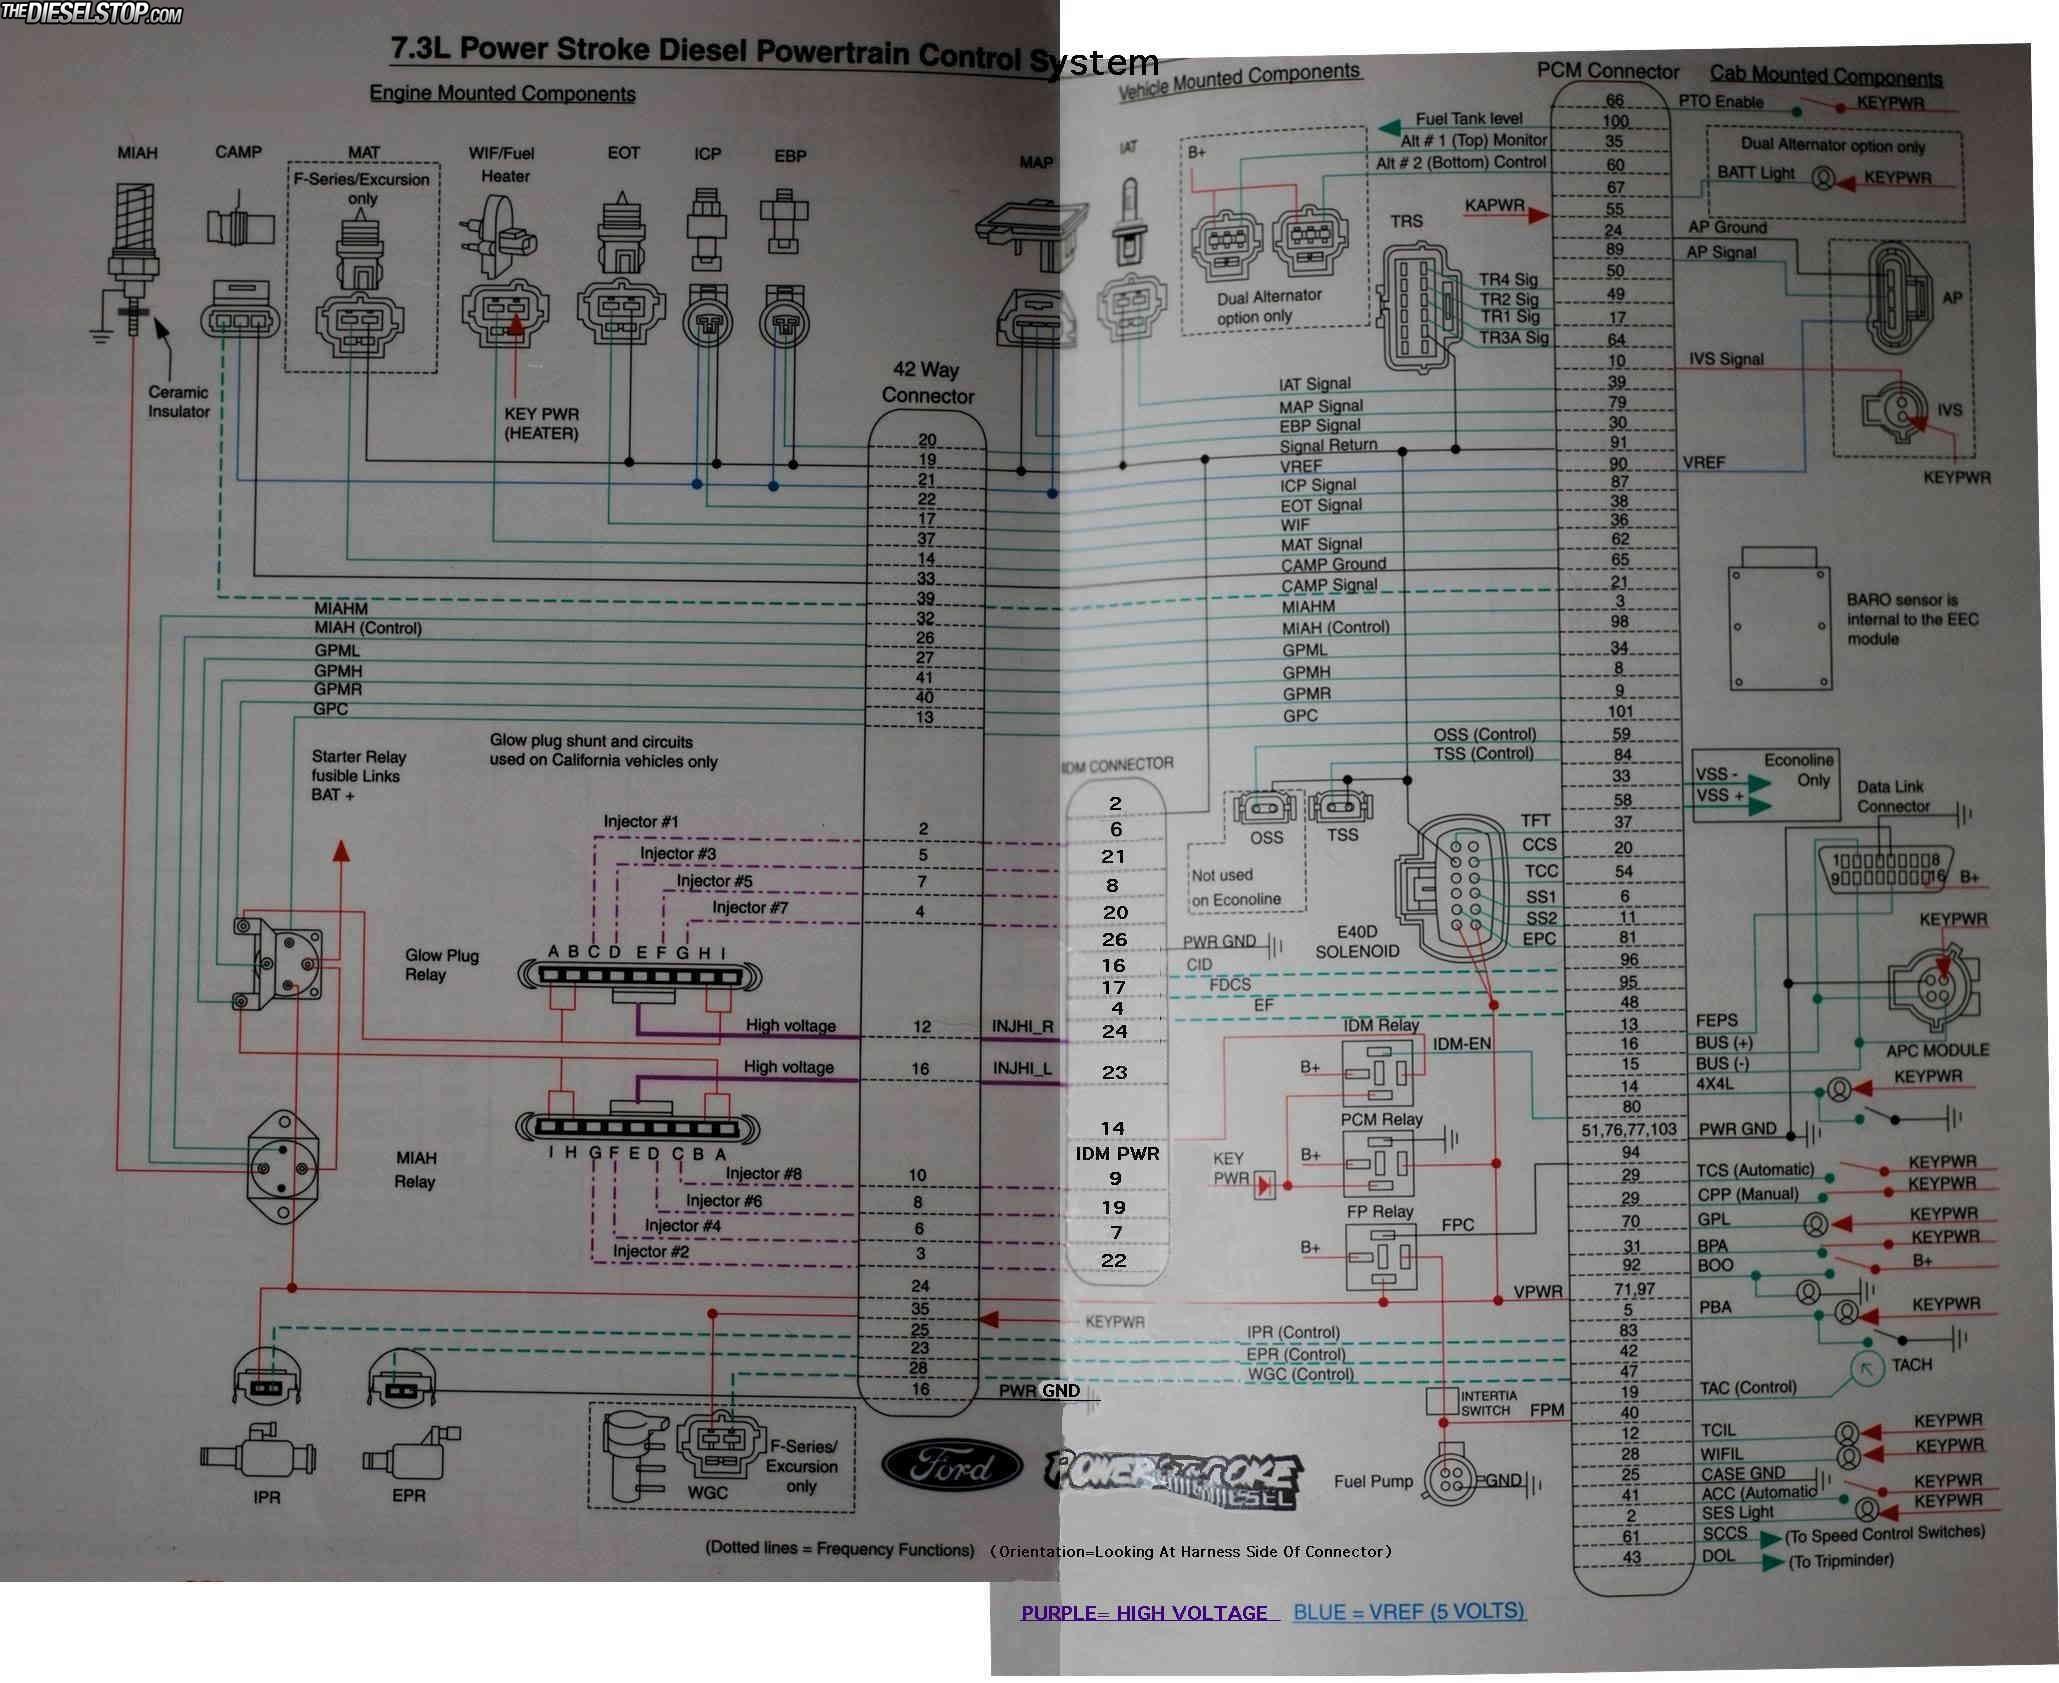 7 3 L Powerstroke Engine Diagram 7 3l Wiring Schematic Printable Very Handy Diesel forum Of 7 3 L Powerstroke Engine Diagram